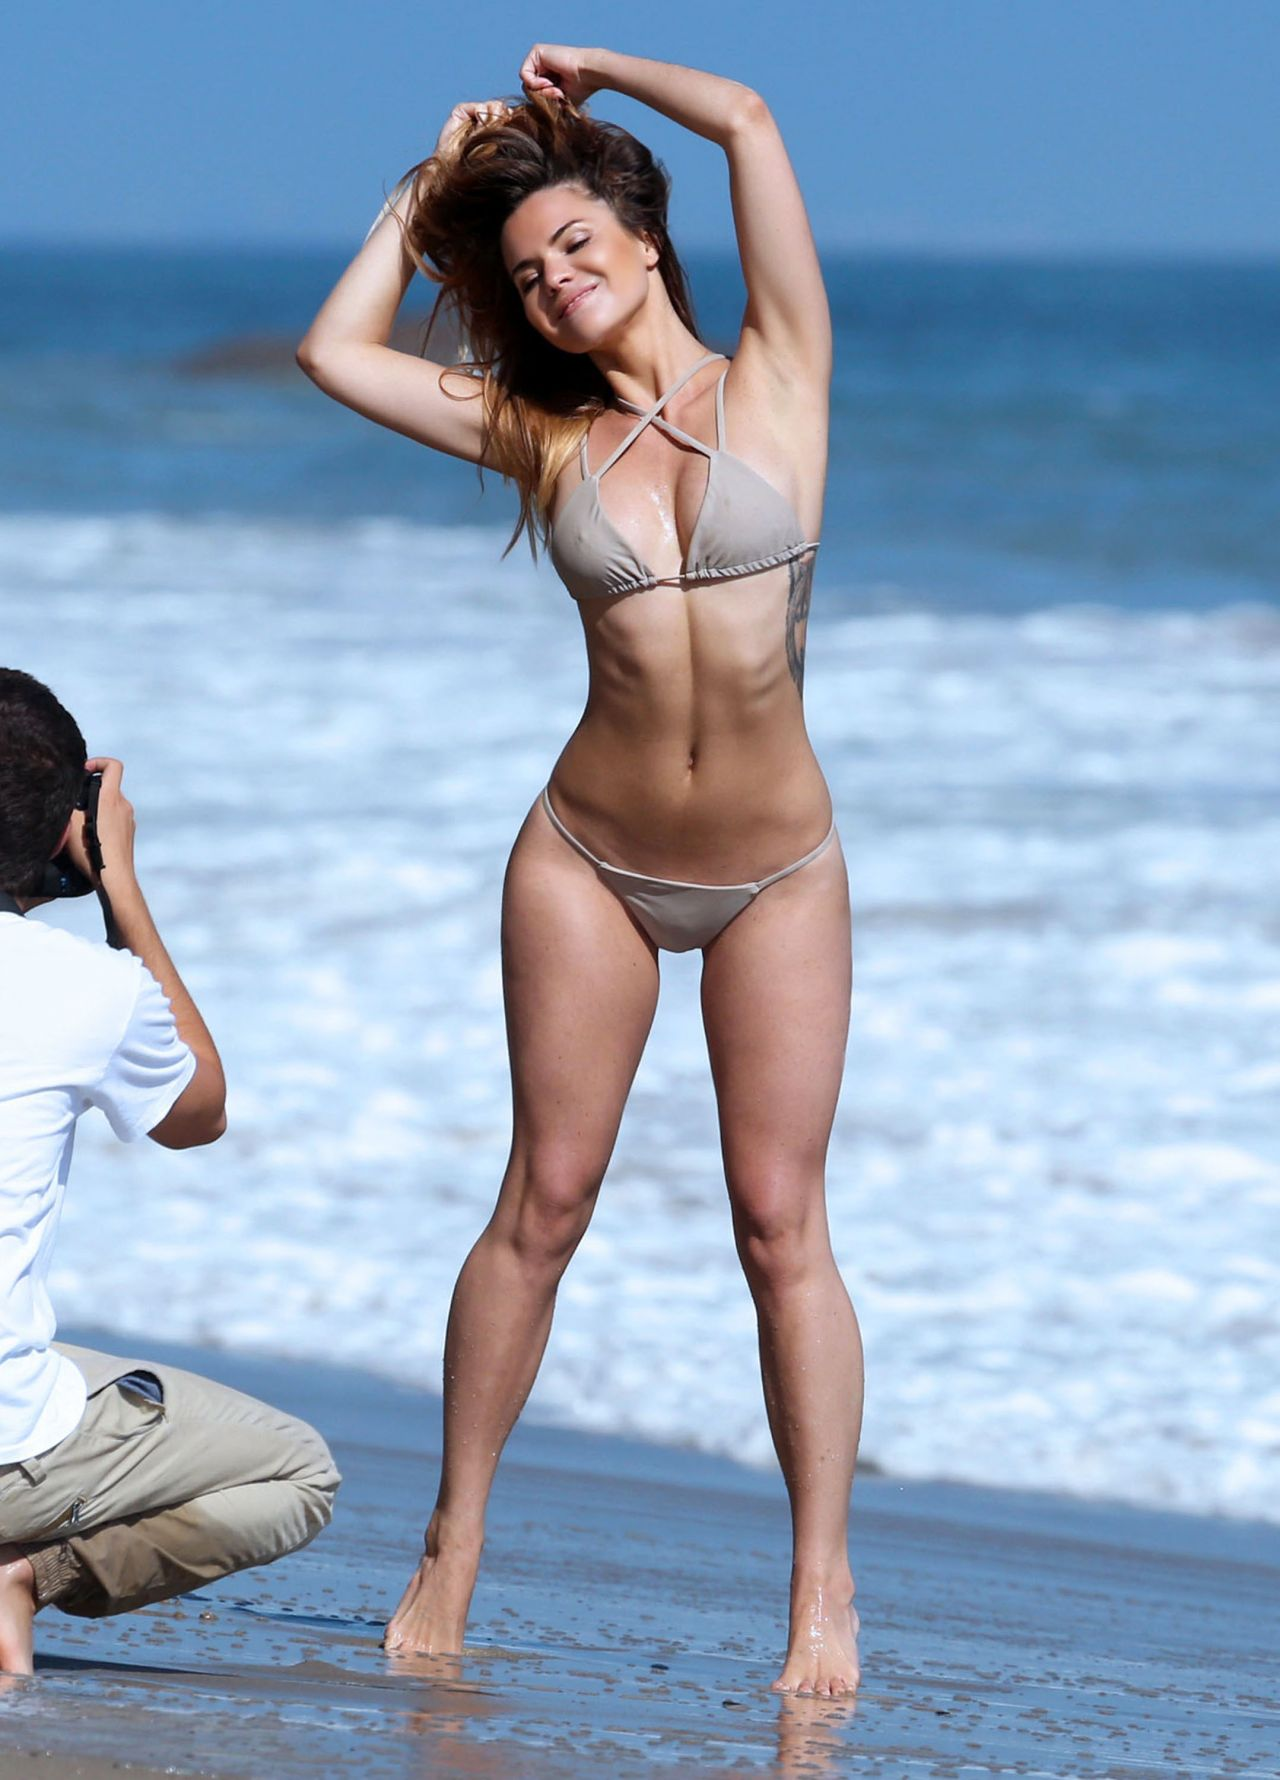 Bikini Kaili Thorne nudes (29 foto and video), Sexy, Is a cute, Selfie, see through 2017